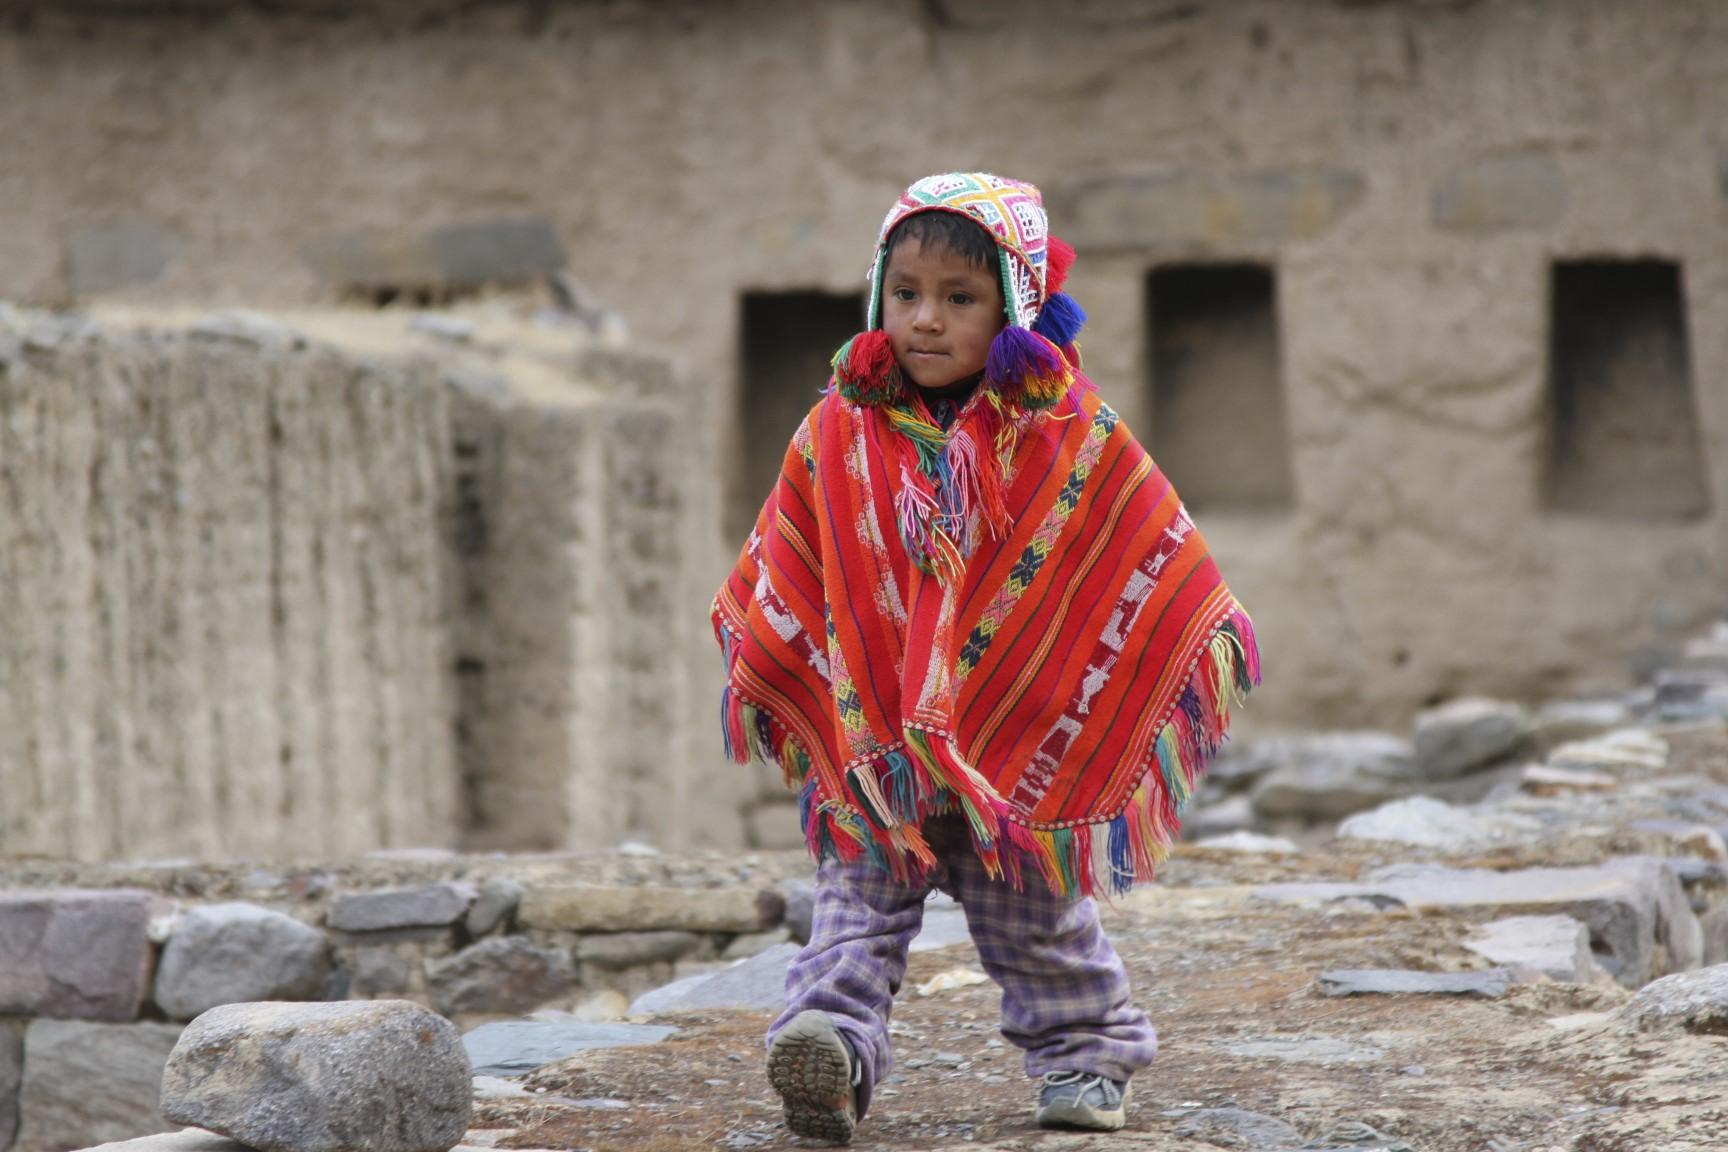 modern peru Mining and the social politics that shape the peruvian landscape read article   resistance songs: afroperuvian music in modern peru  read article.